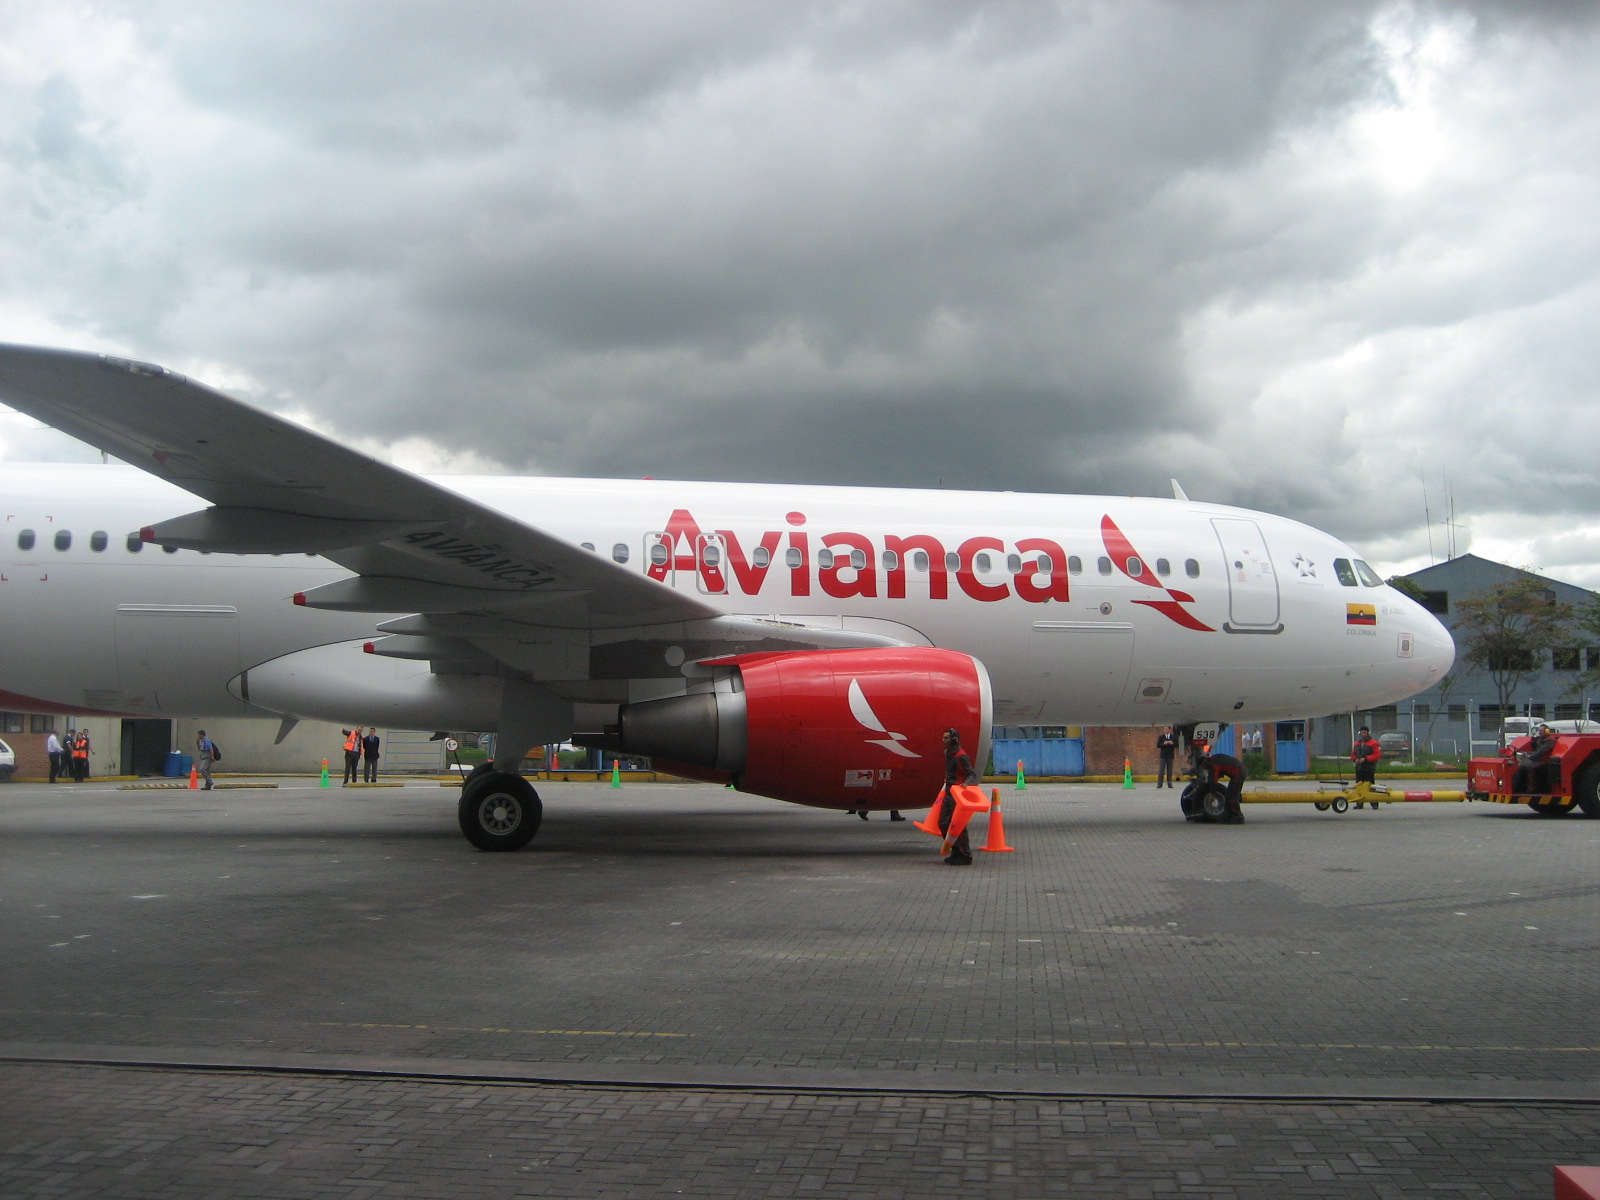 Avianca Holdings S.A. transportó 7.9 millones de pasajeros